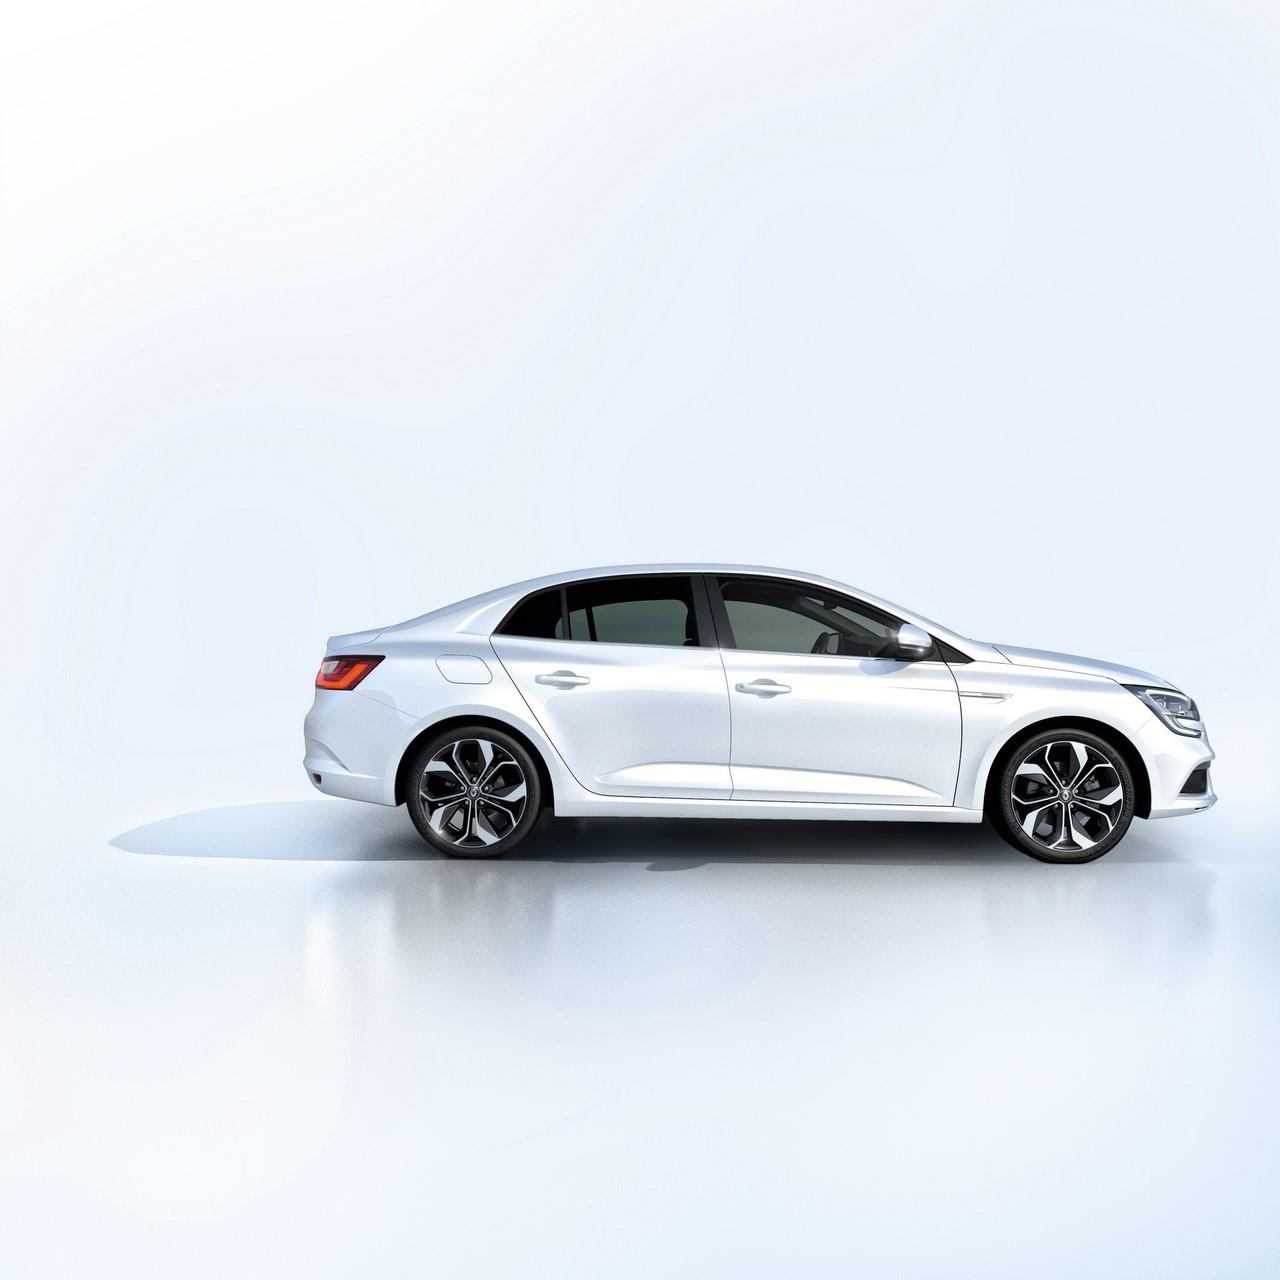 2016 Renault Megane Sedan profile studio image